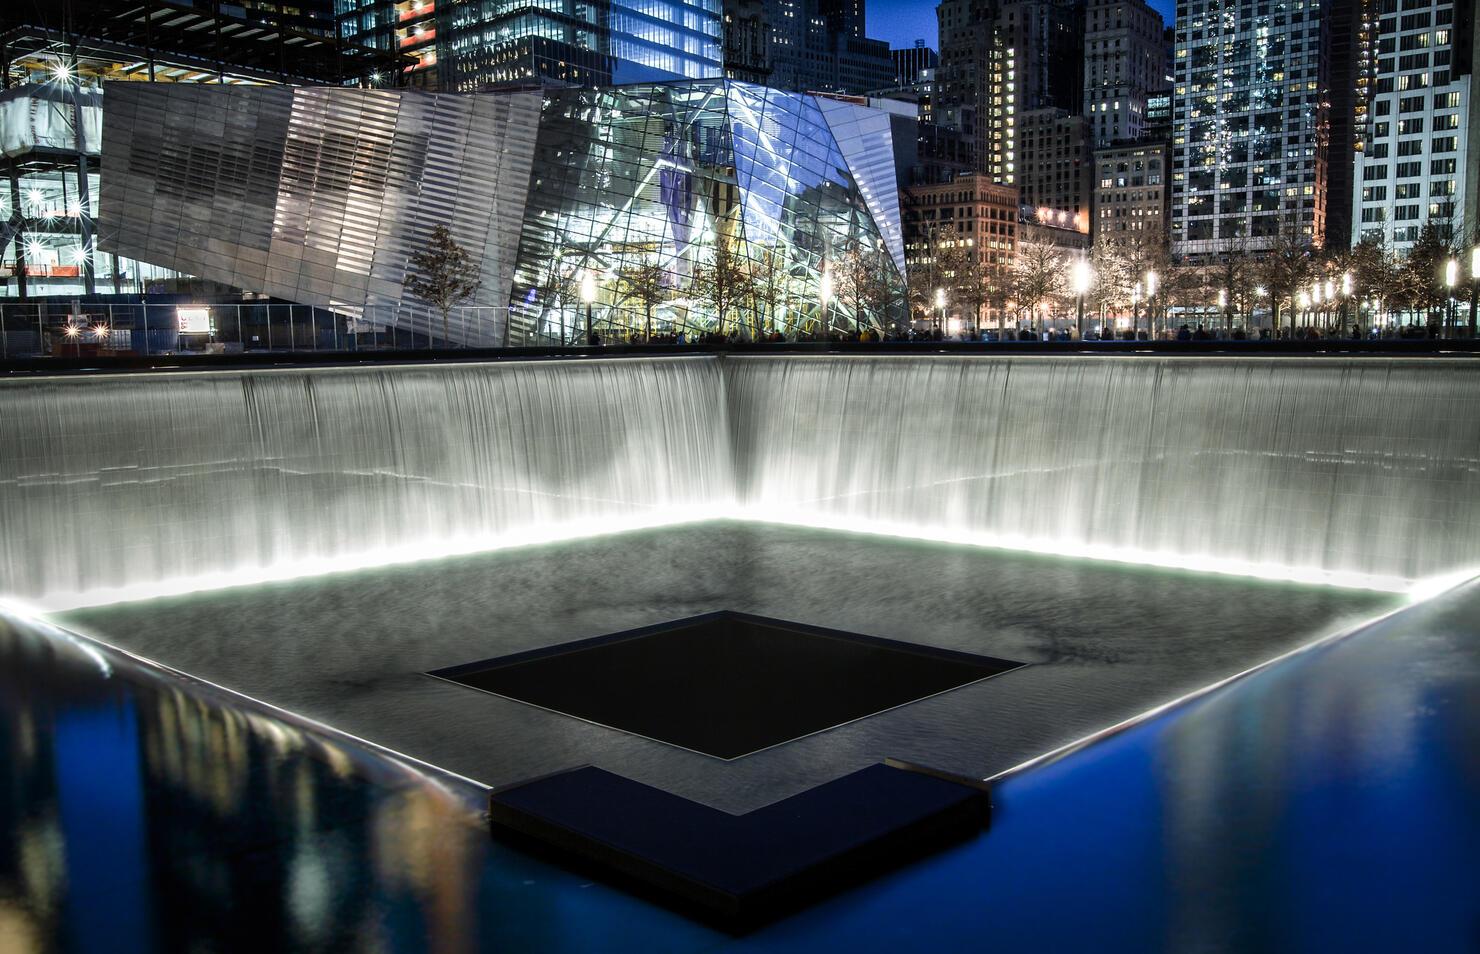 The National September 11 Memorial at Night